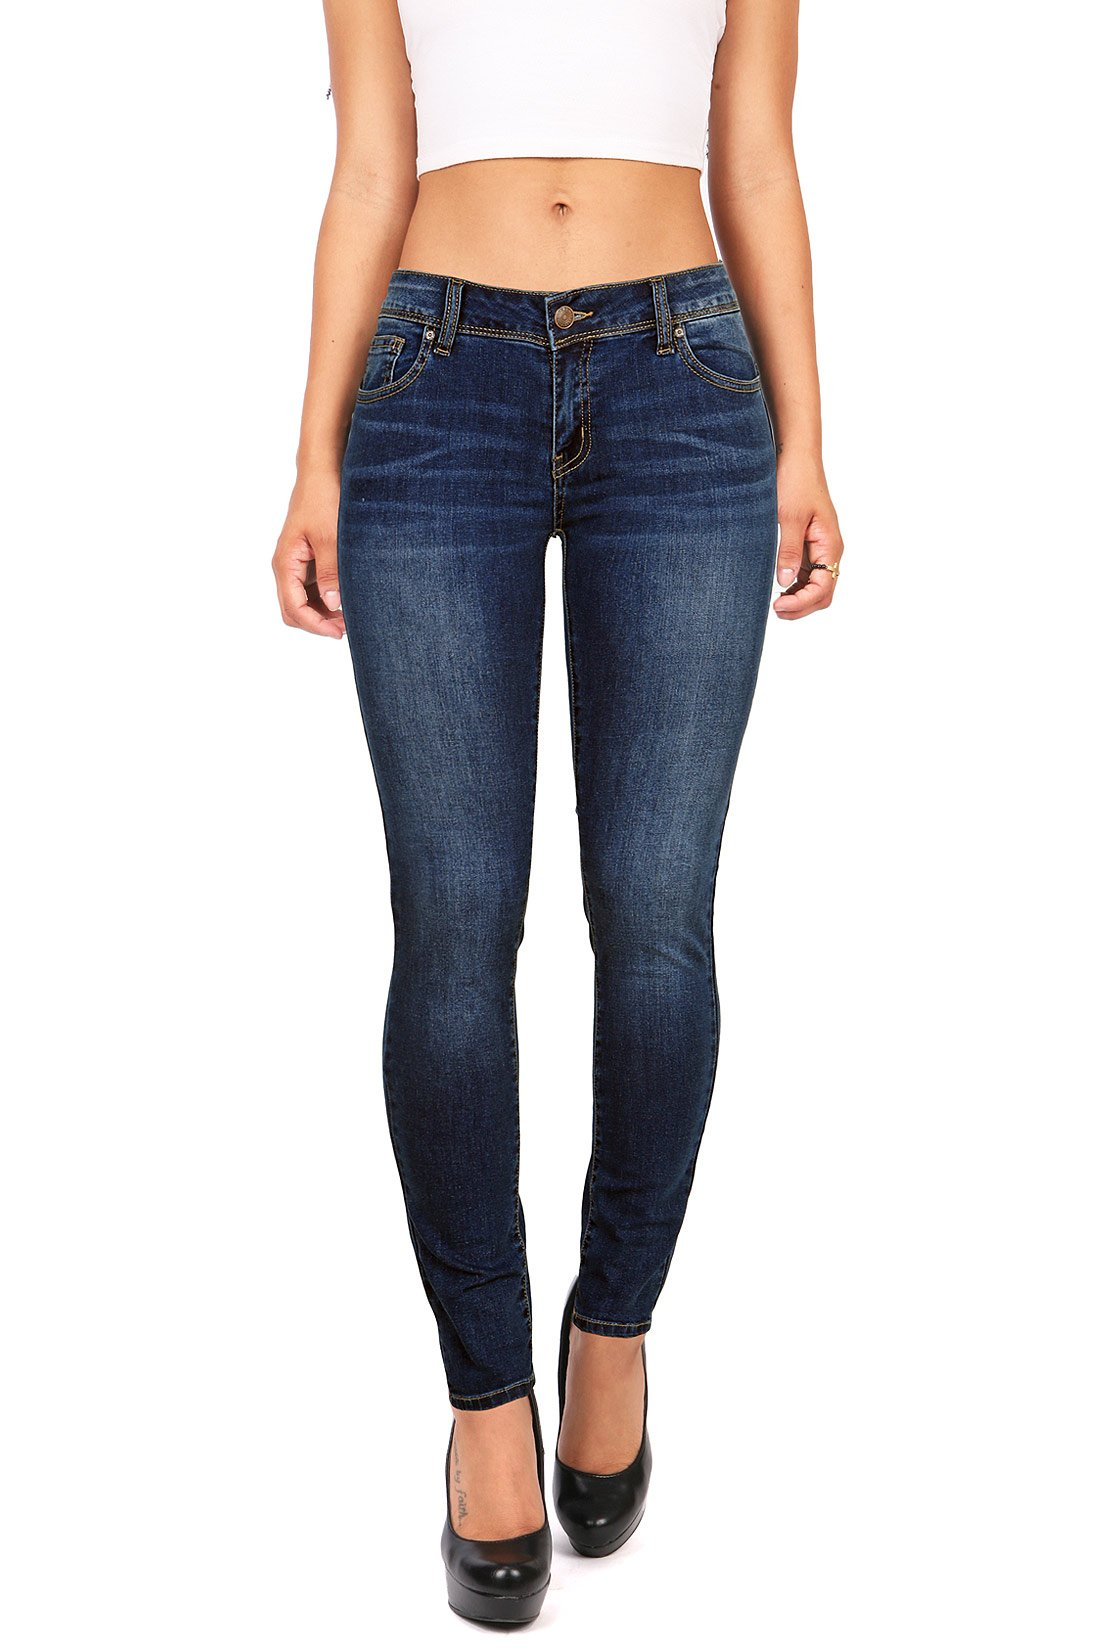 Wax Denim Women's Juniors Basic Stretchy Fit Skinny Jeans (14, Dark Denim)